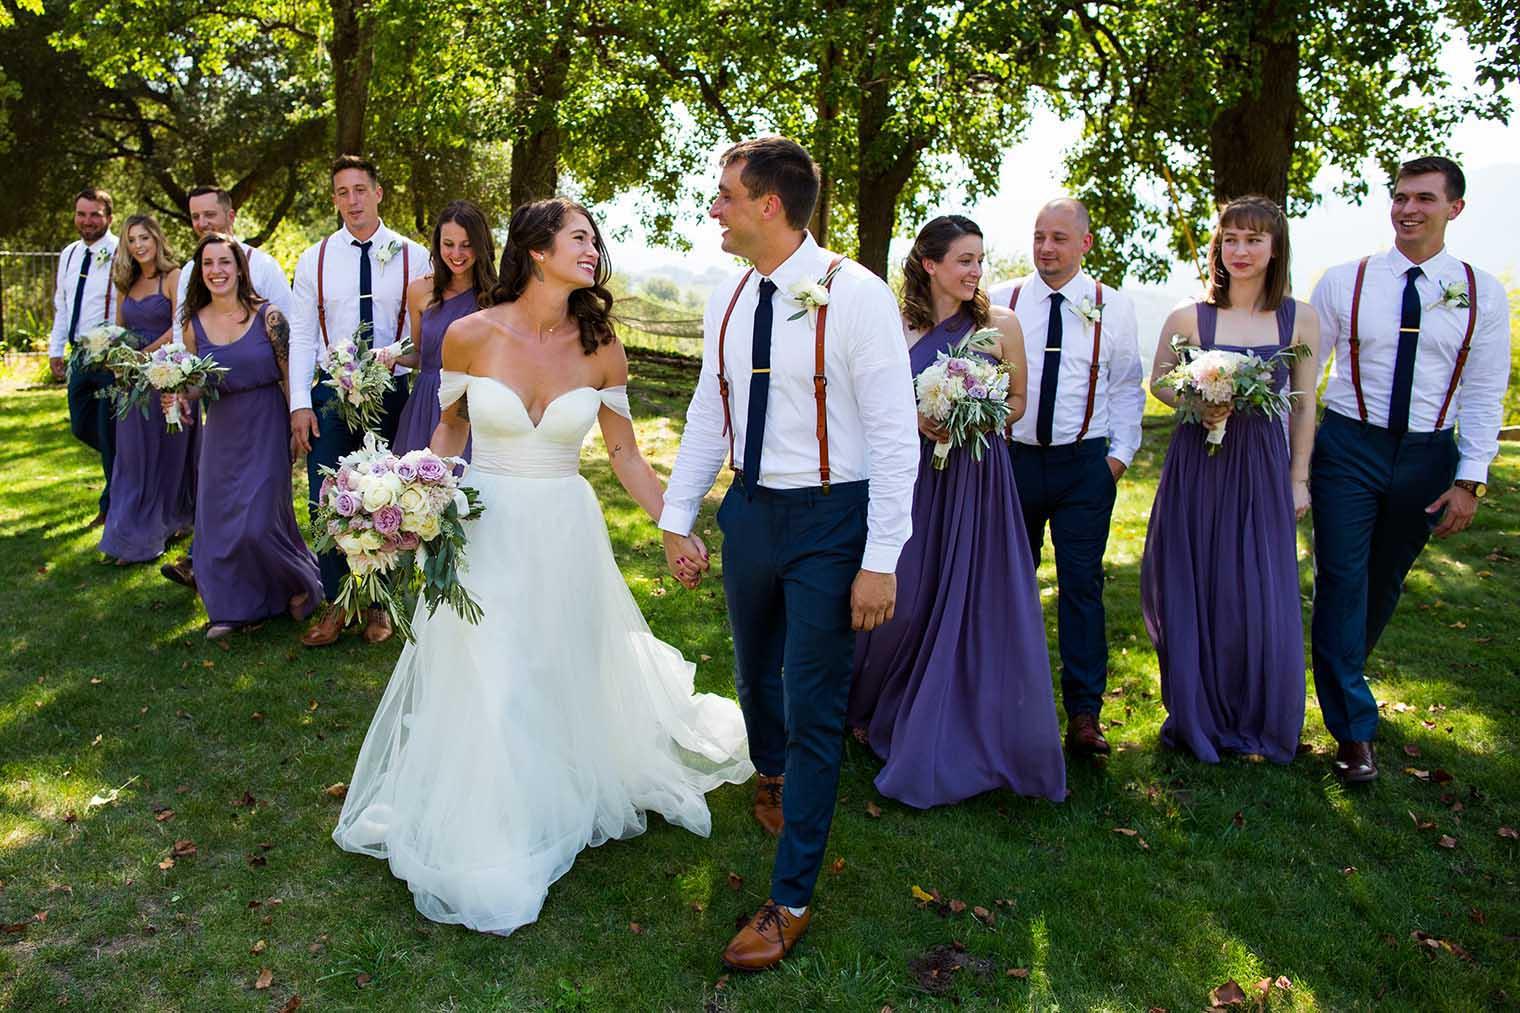 Bridal party in Napa, California